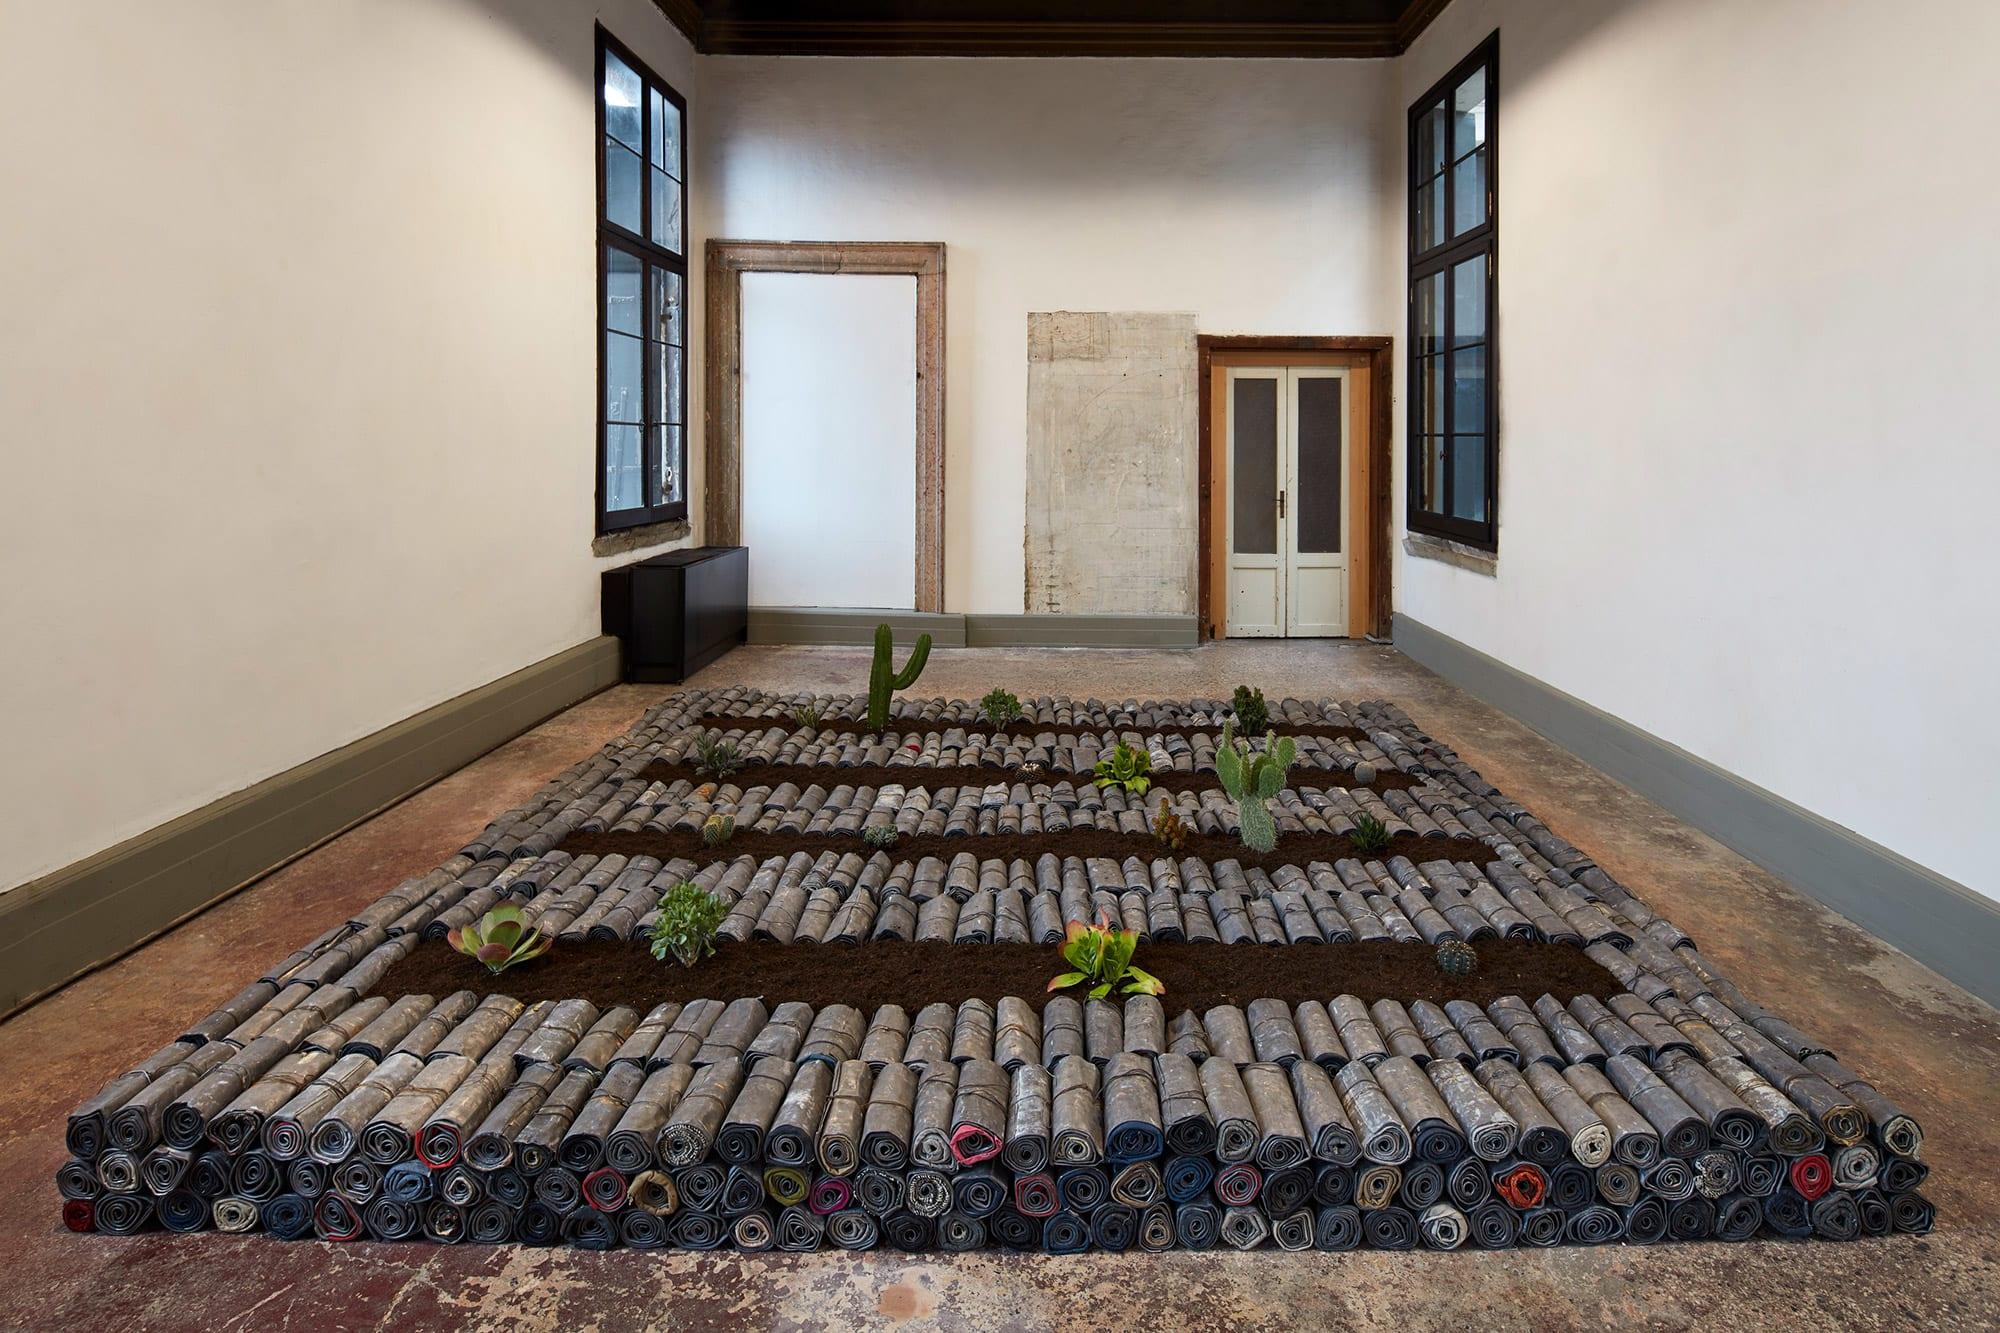 Jannis Kounellis | Fondazione Prada